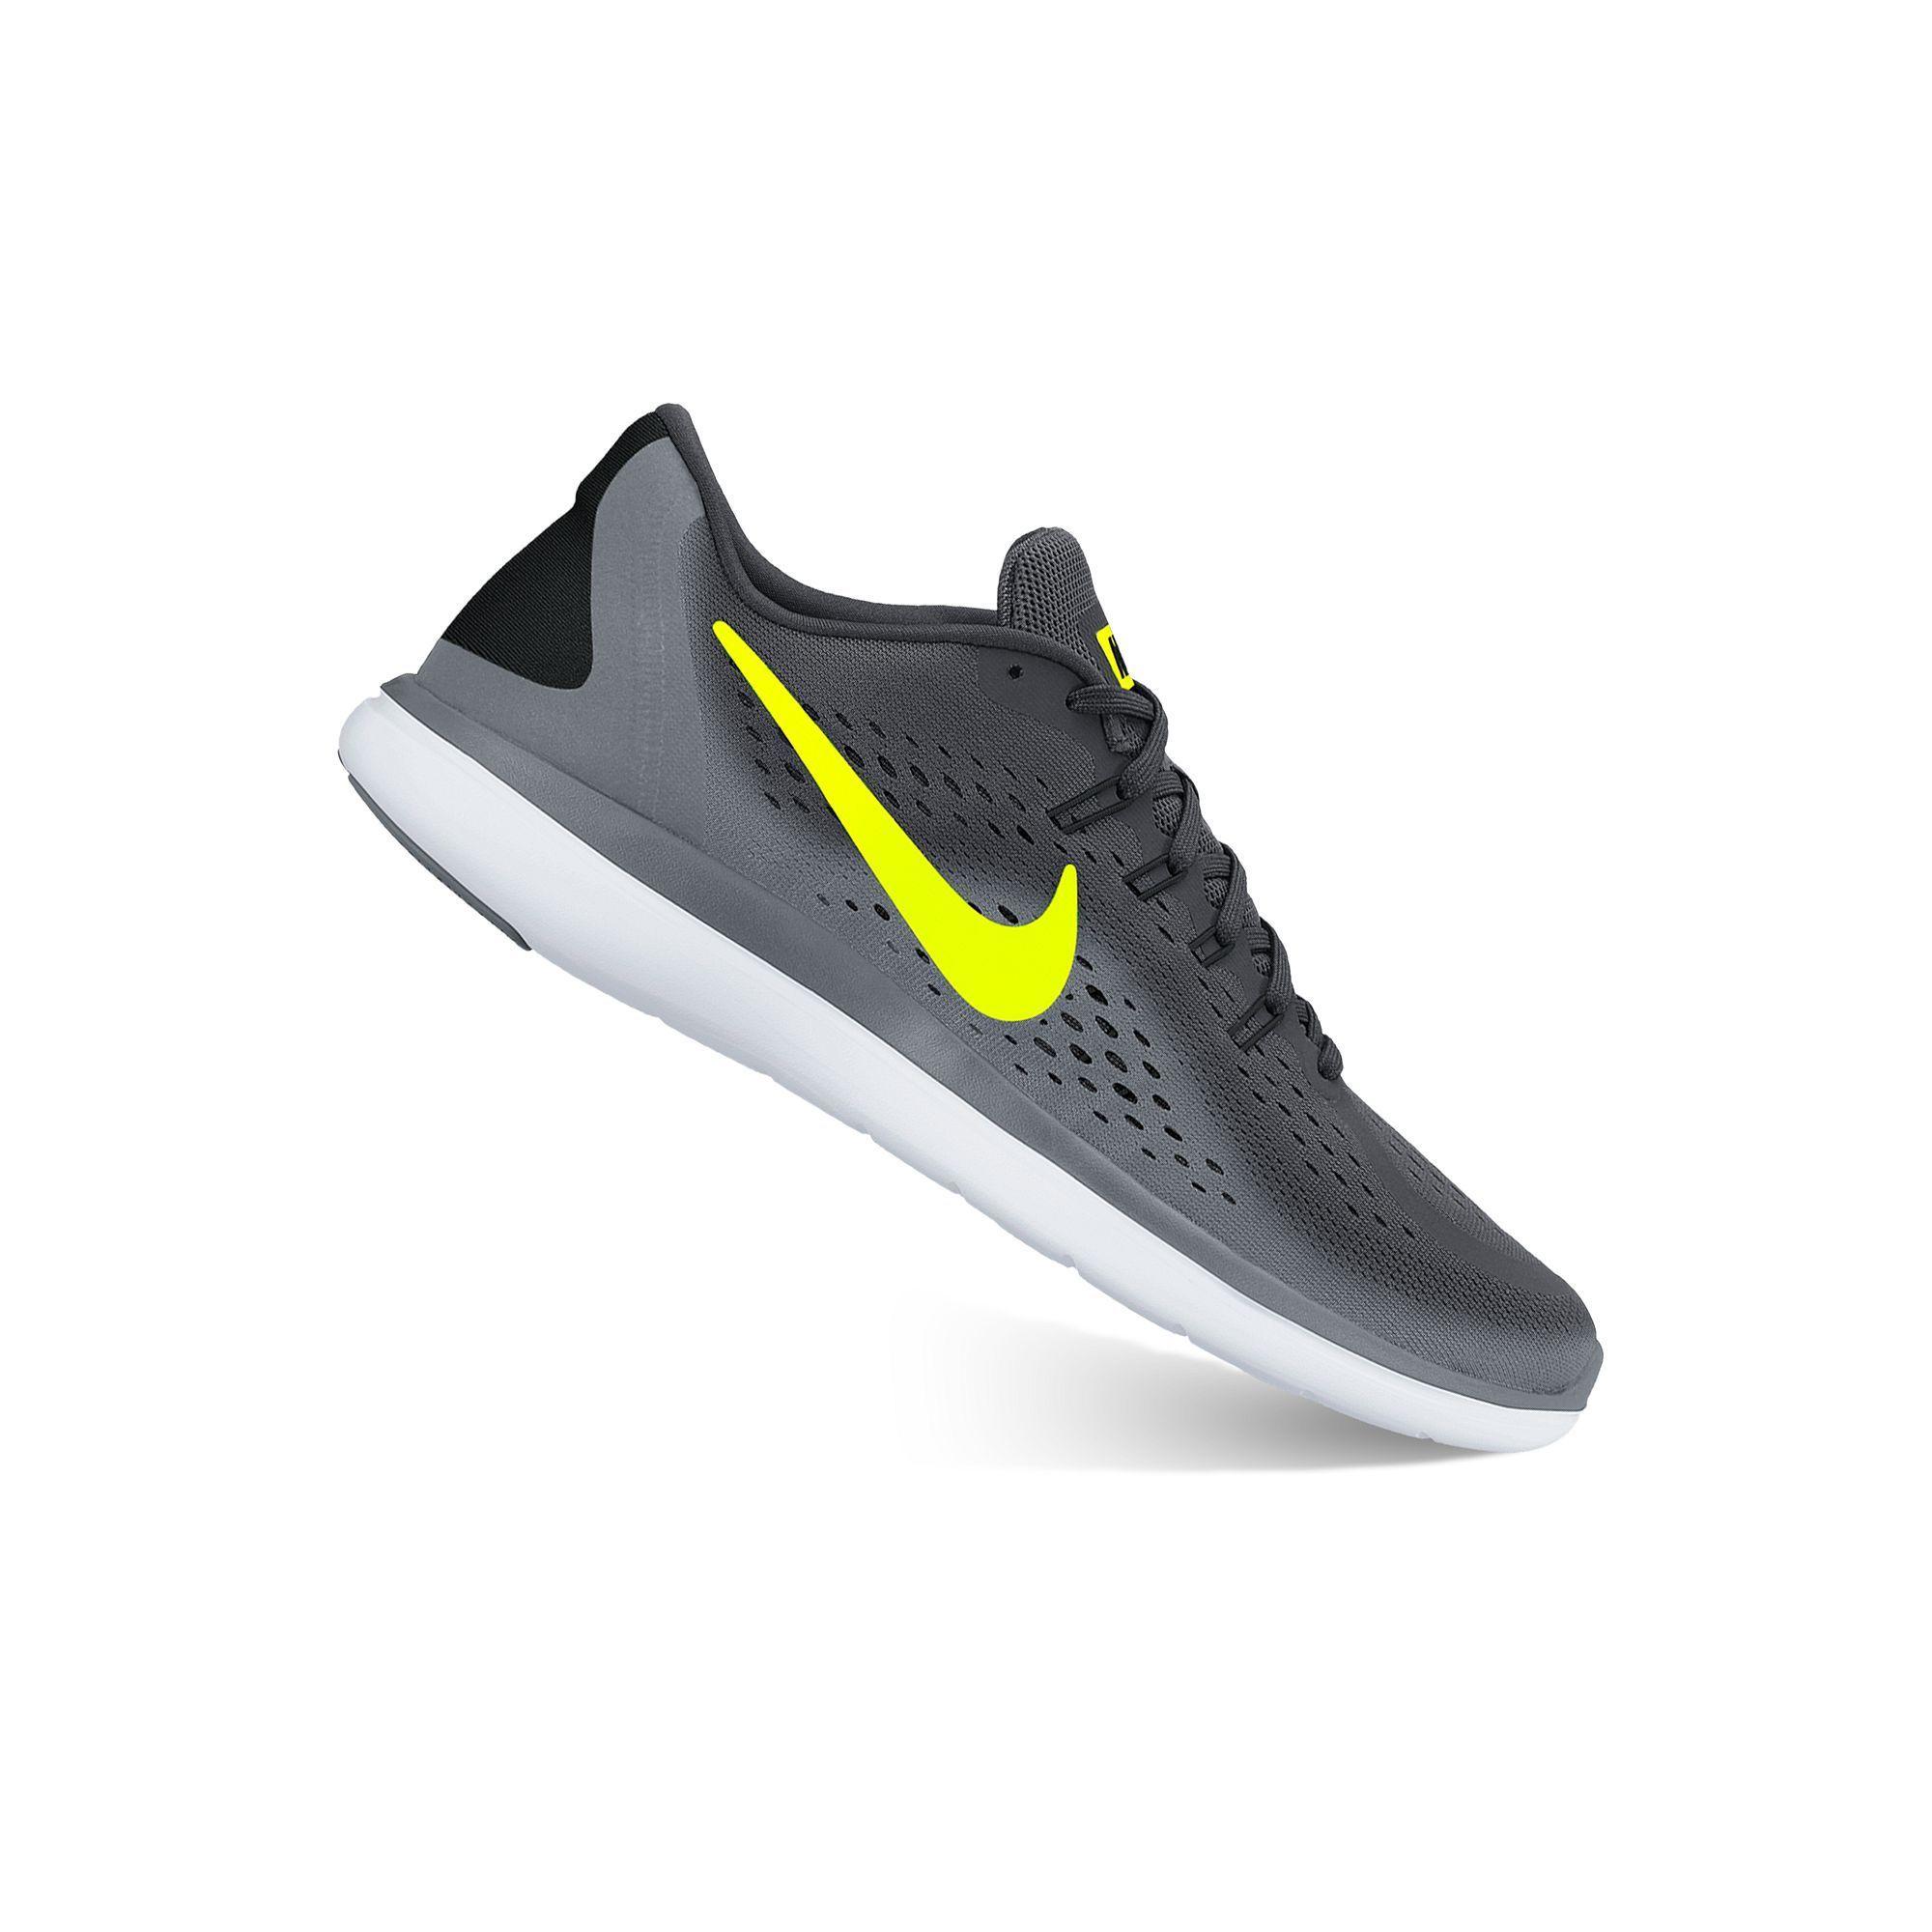 Nike Flex 2017 RN Men's Running Shoes, Size: 7, Black